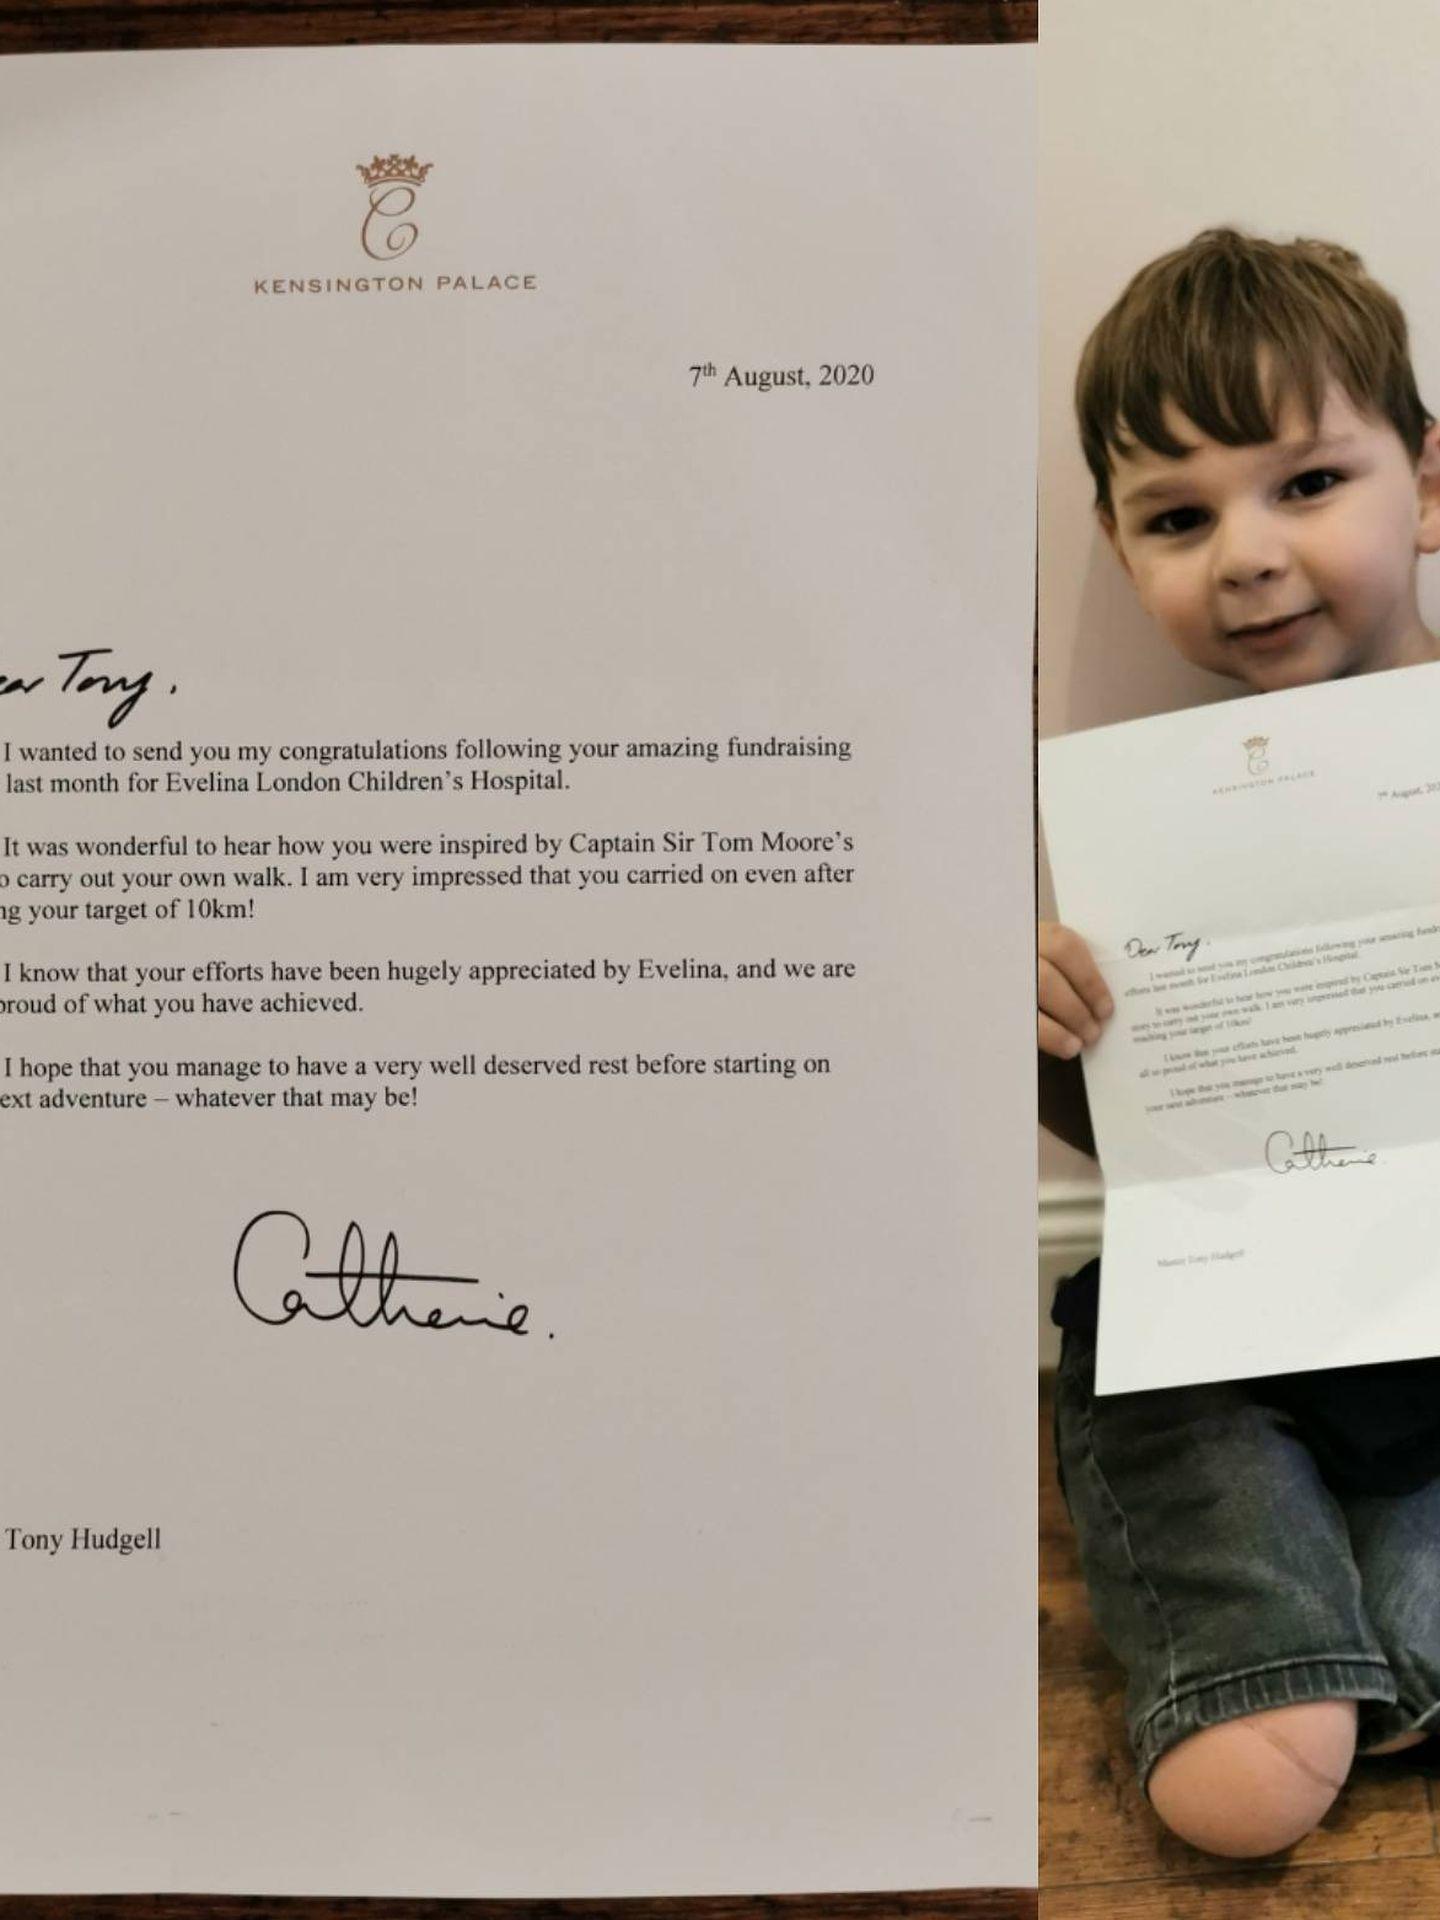 El niño Tony Hudgell, con una carta enviada por Kate Middleton. (Twitter: @bearsjourney)